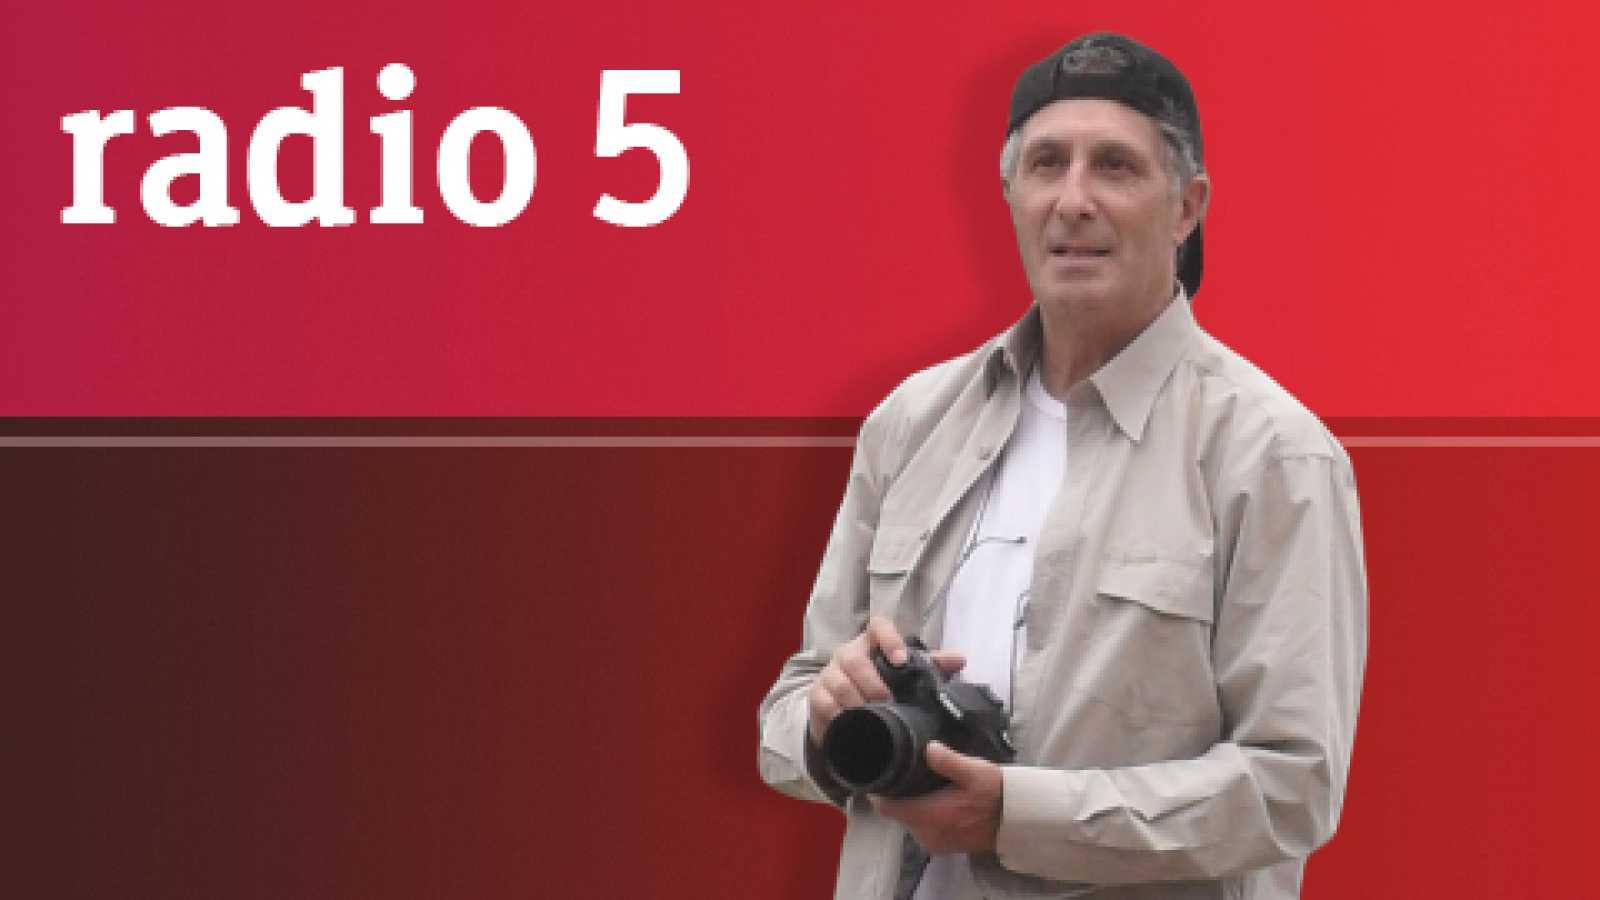 Crónicas de un nómada - Problemas cervicales - 28/06/17 - escuchar ahora